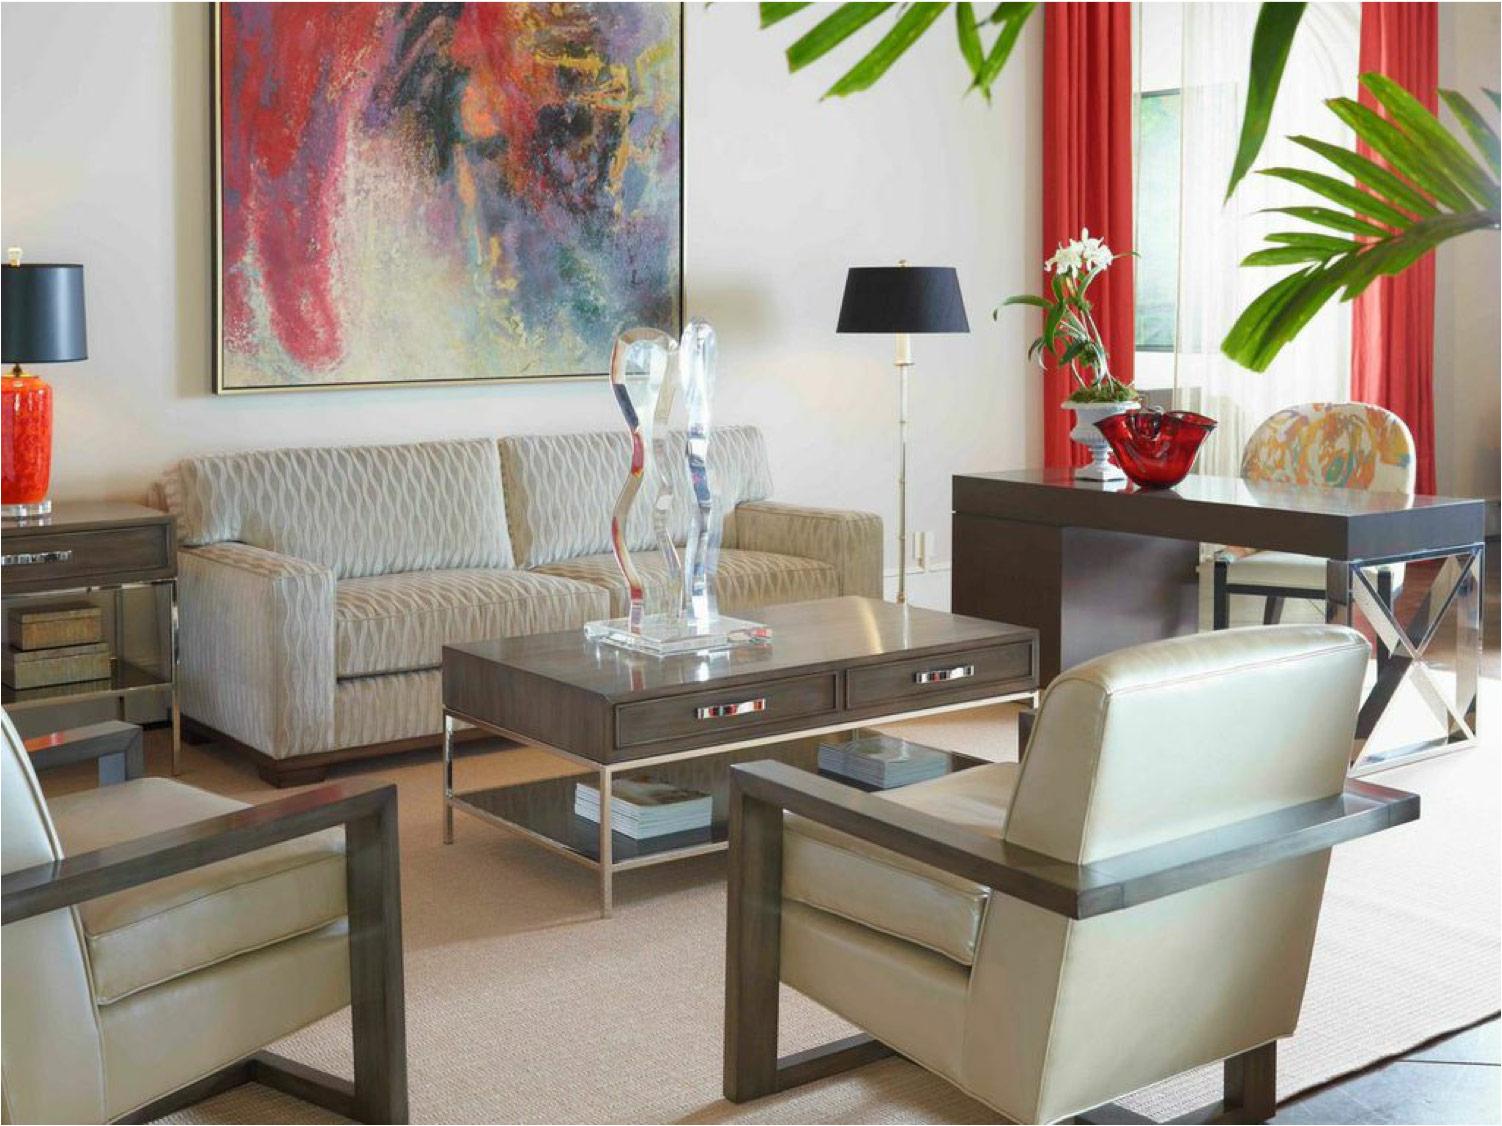 Top New Jersey interior designer Ron Nathan